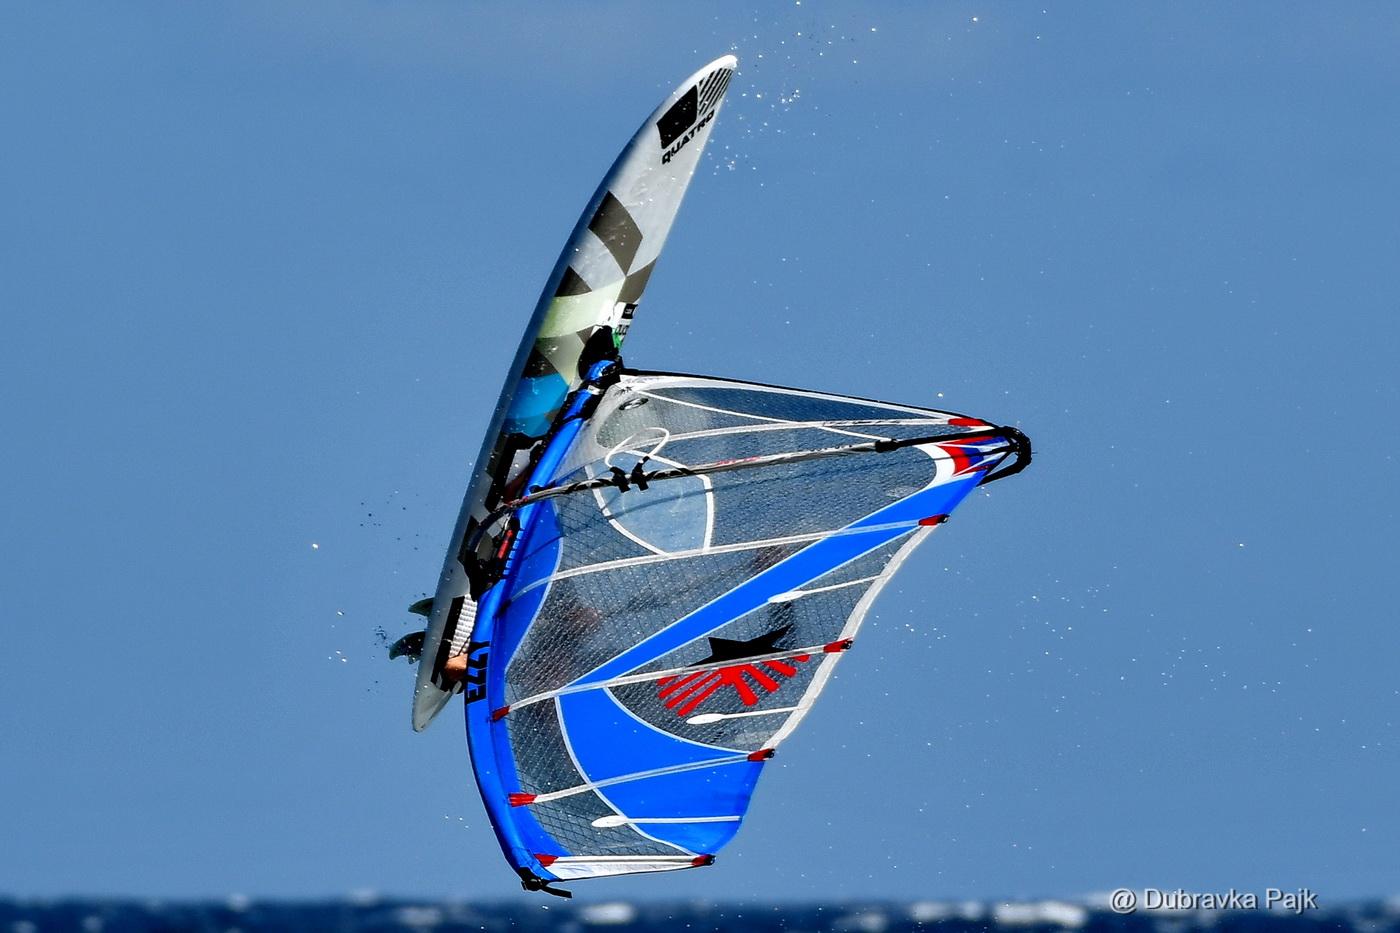 Freestyle Windsurfing – El Medano, Tenerife, Canary Islands, March 2020